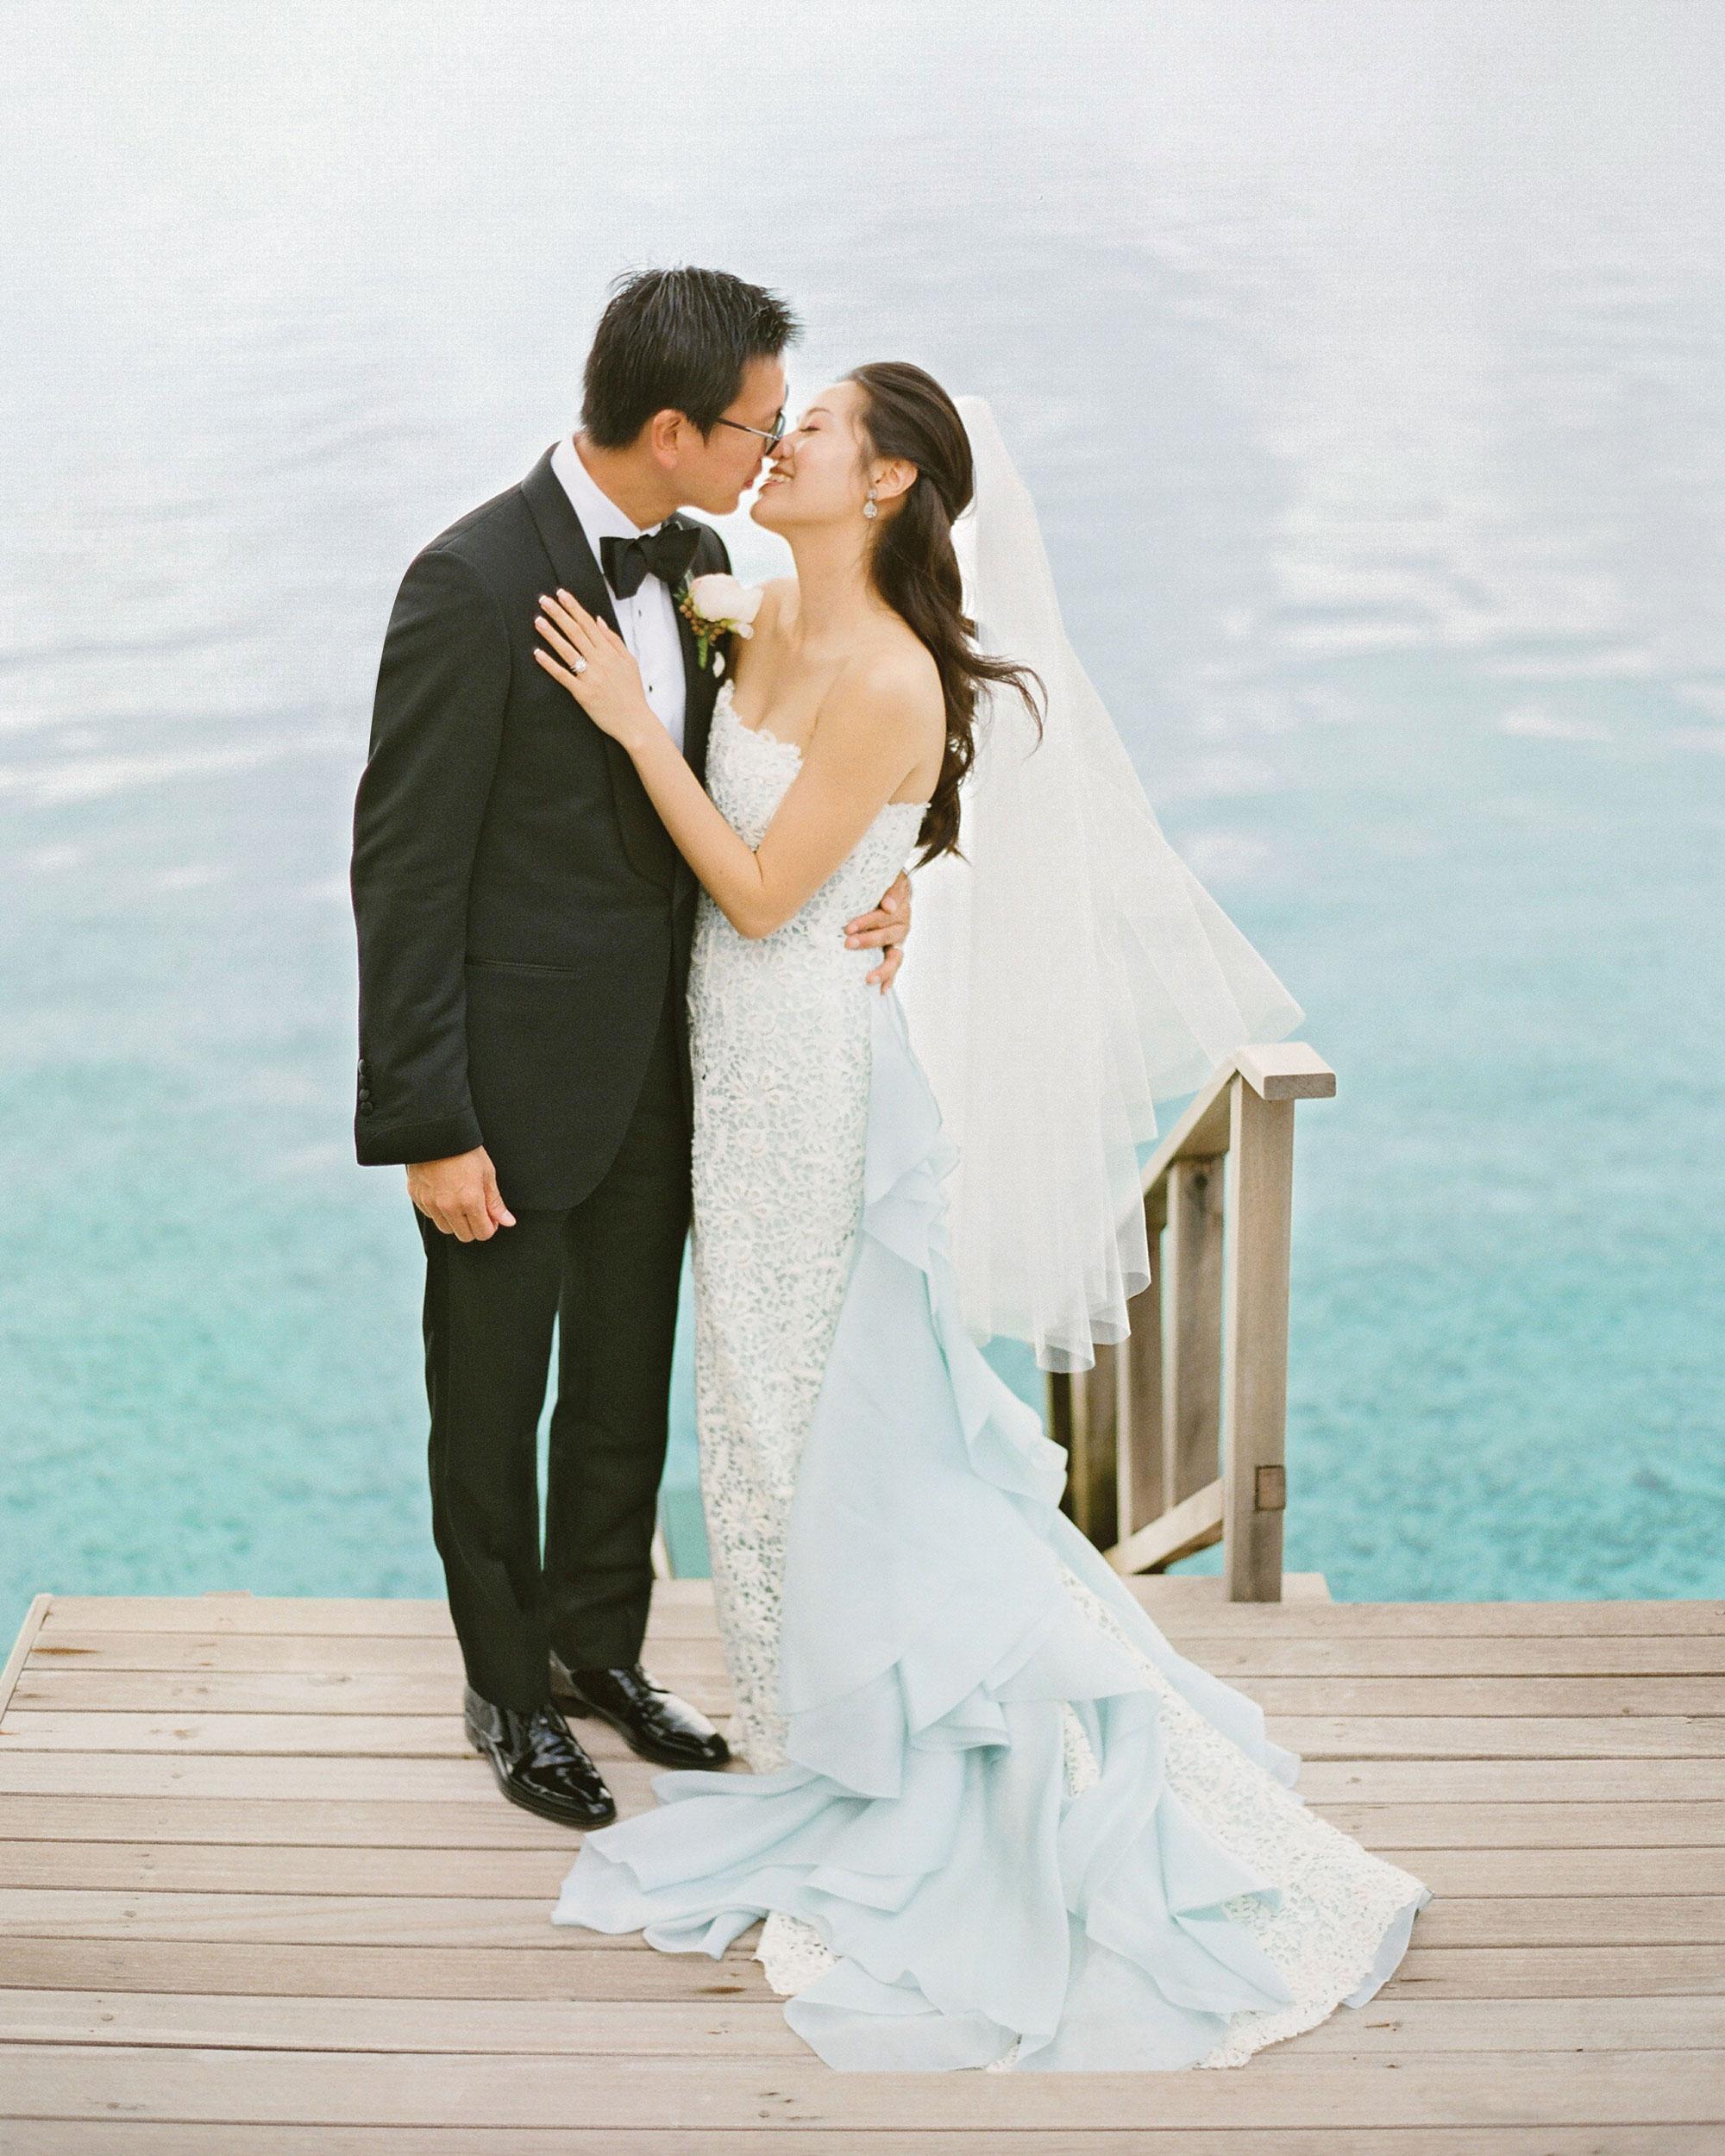 peony-richard-wedding-maldives-bride-groom-kiss-1077-s112383.jpg